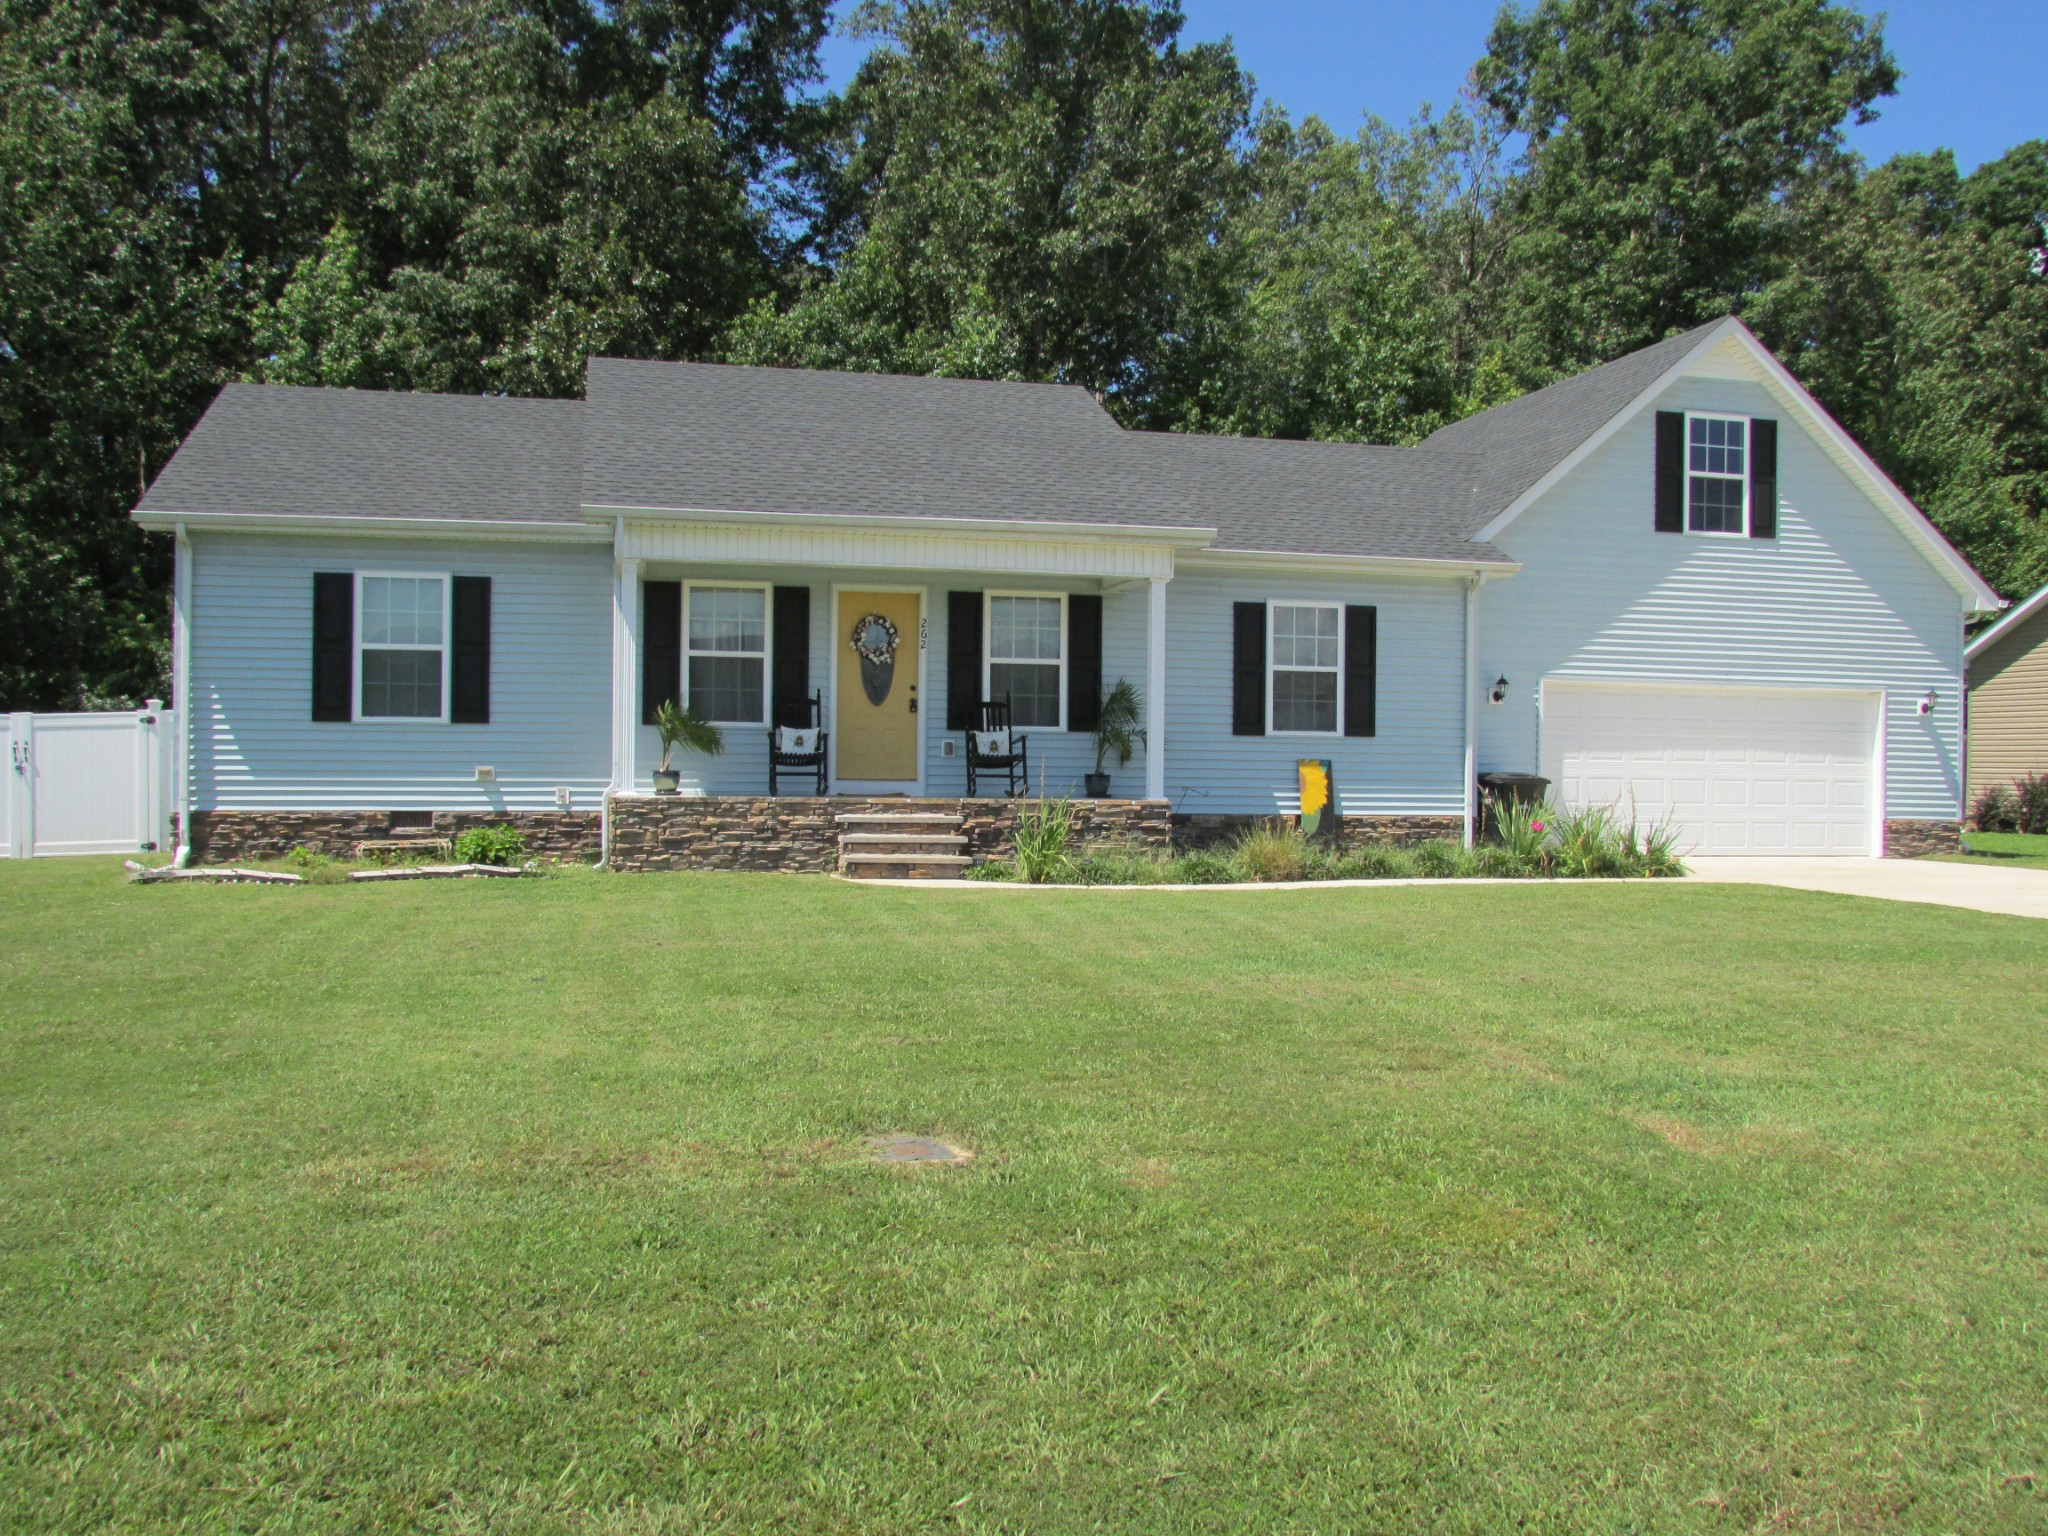 262 Williamsburg Cir Property Photo - Tullahoma, TN real estate listing